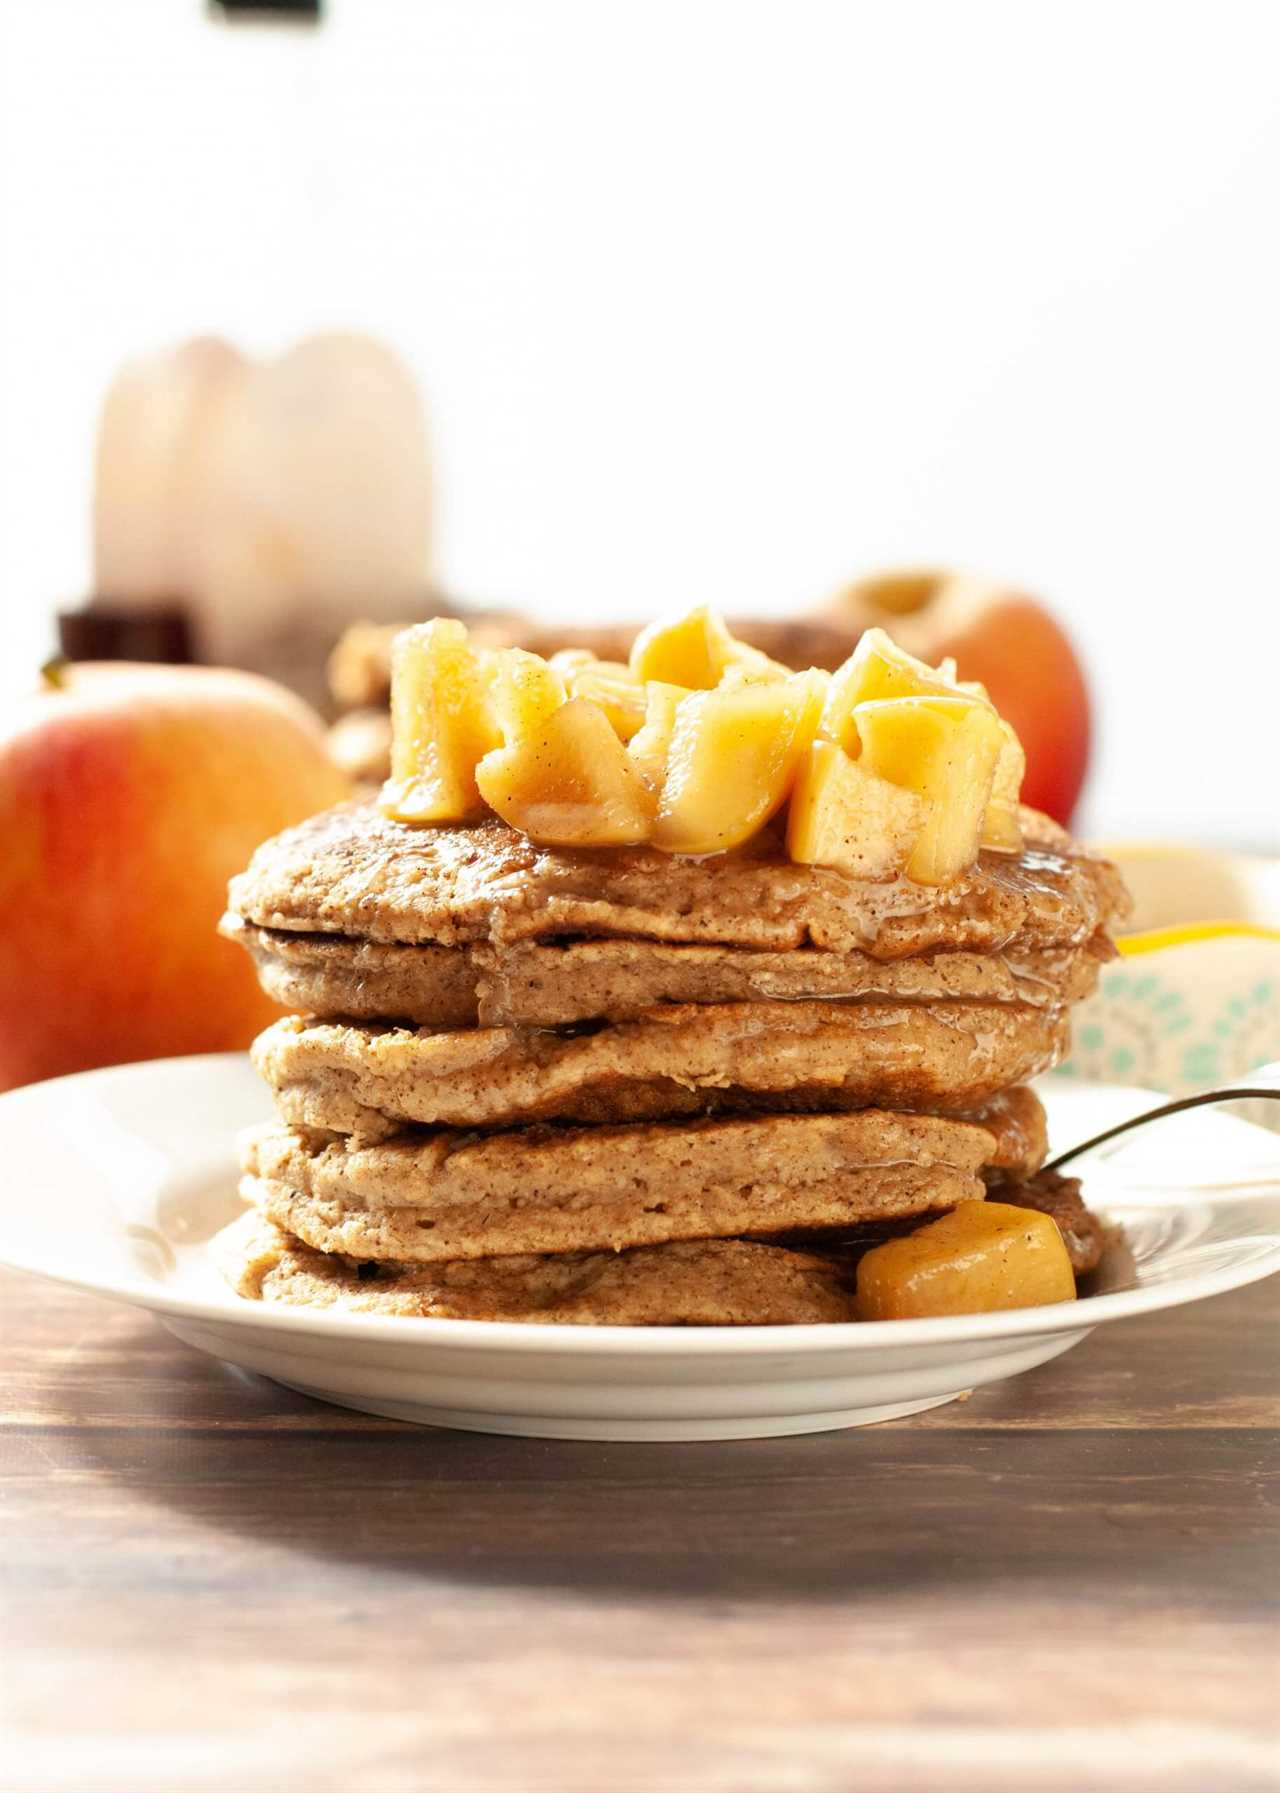 Spiced Apple Oatmeal Pancakes (GF & Vegan)